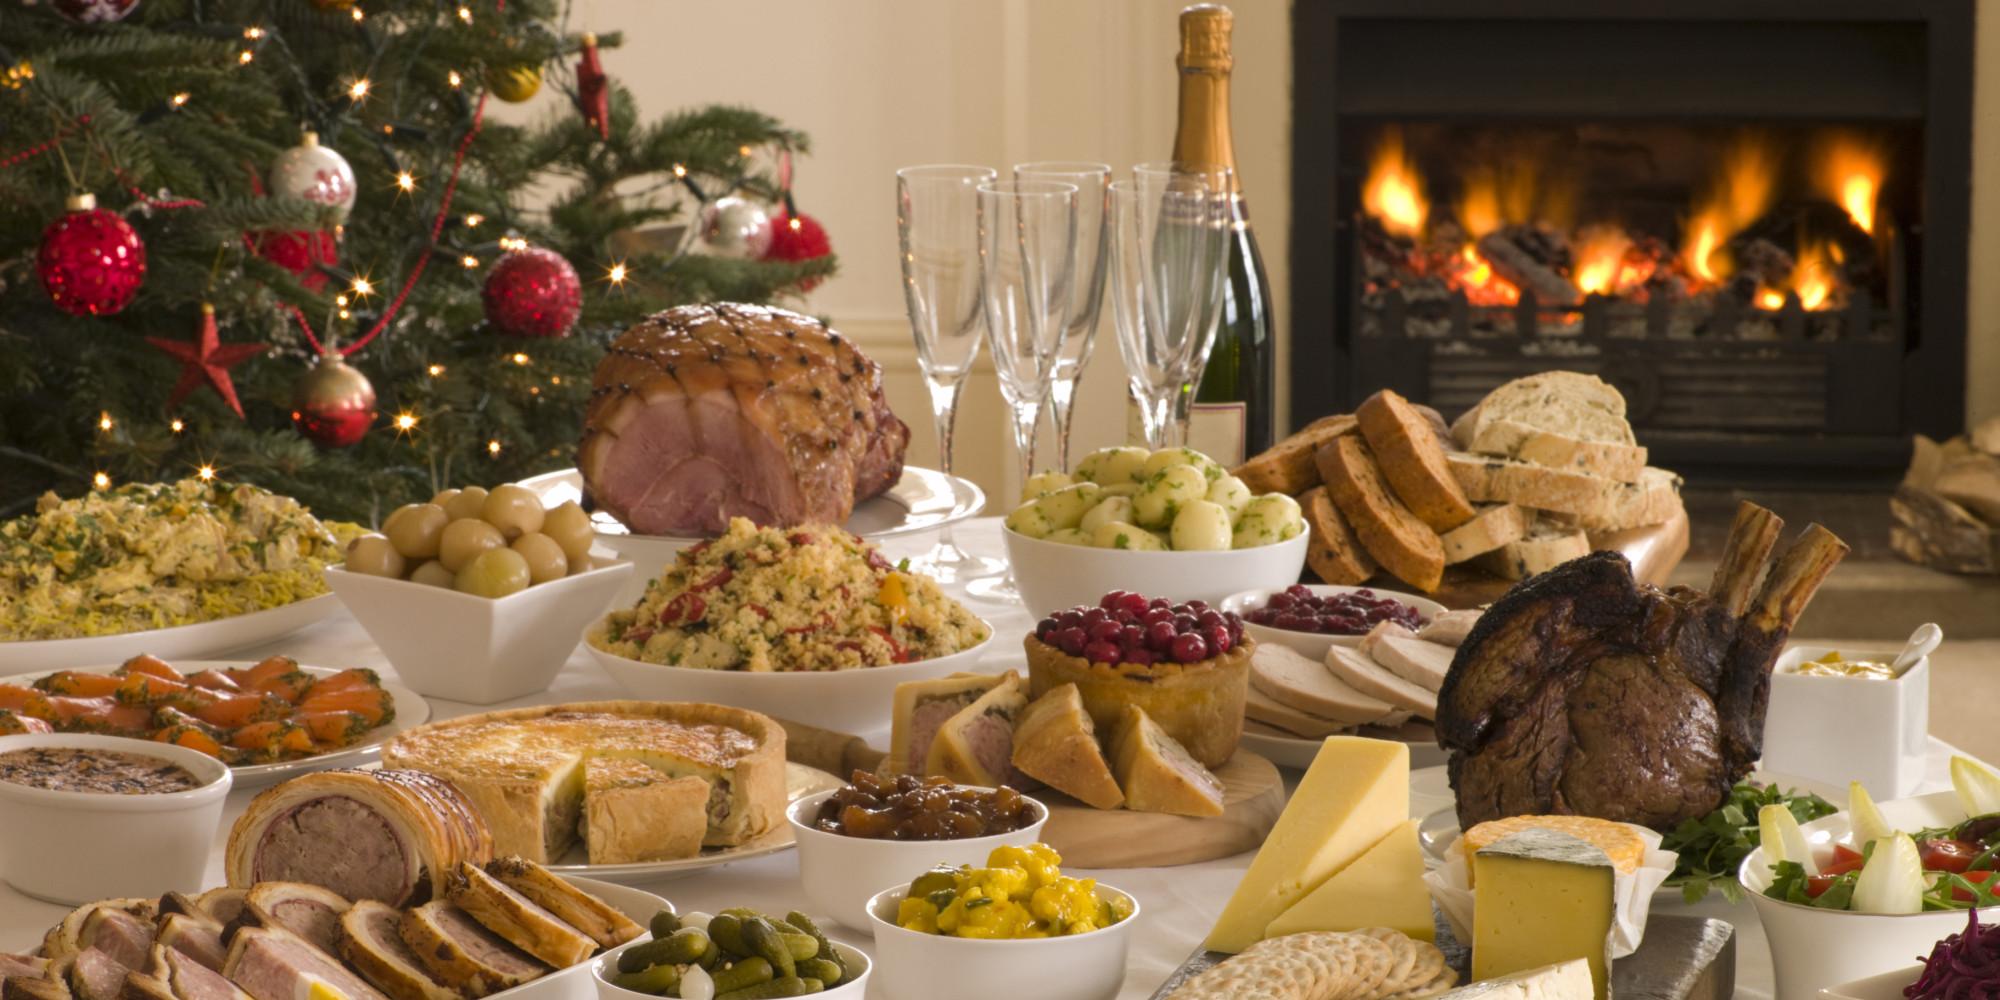 What's Eaten For Christmas Dinner Around The World?